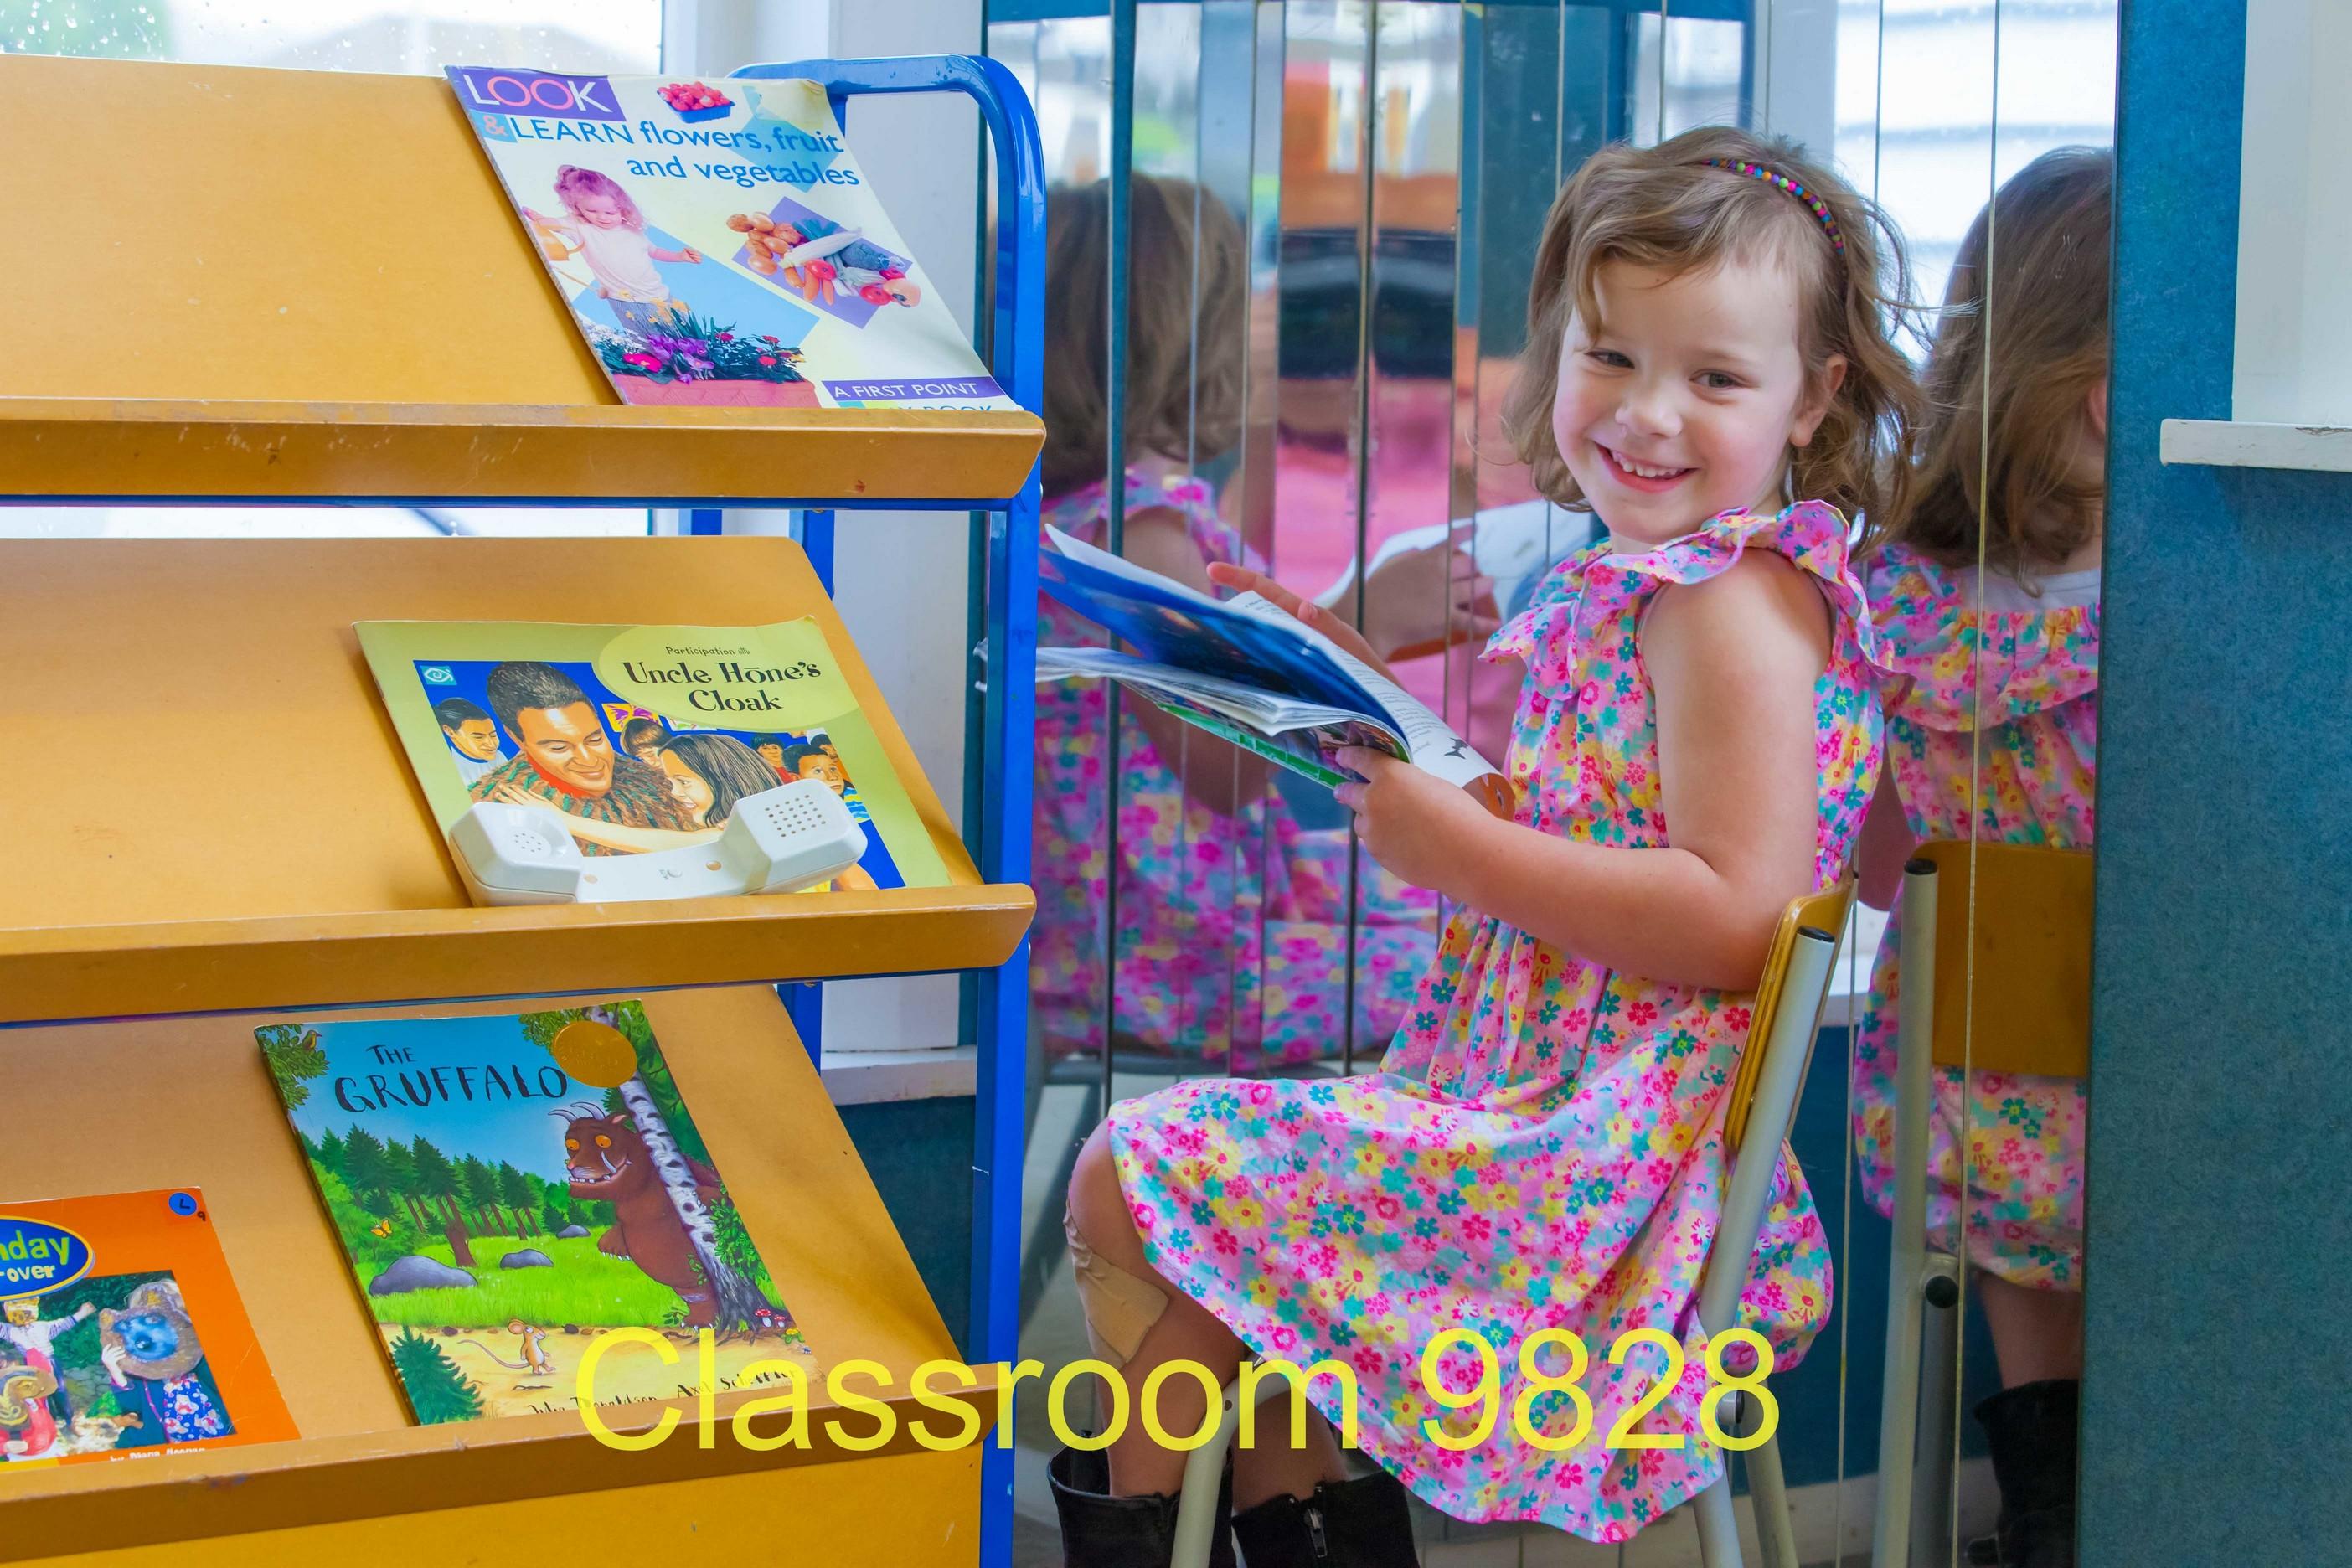 Classroom 9828